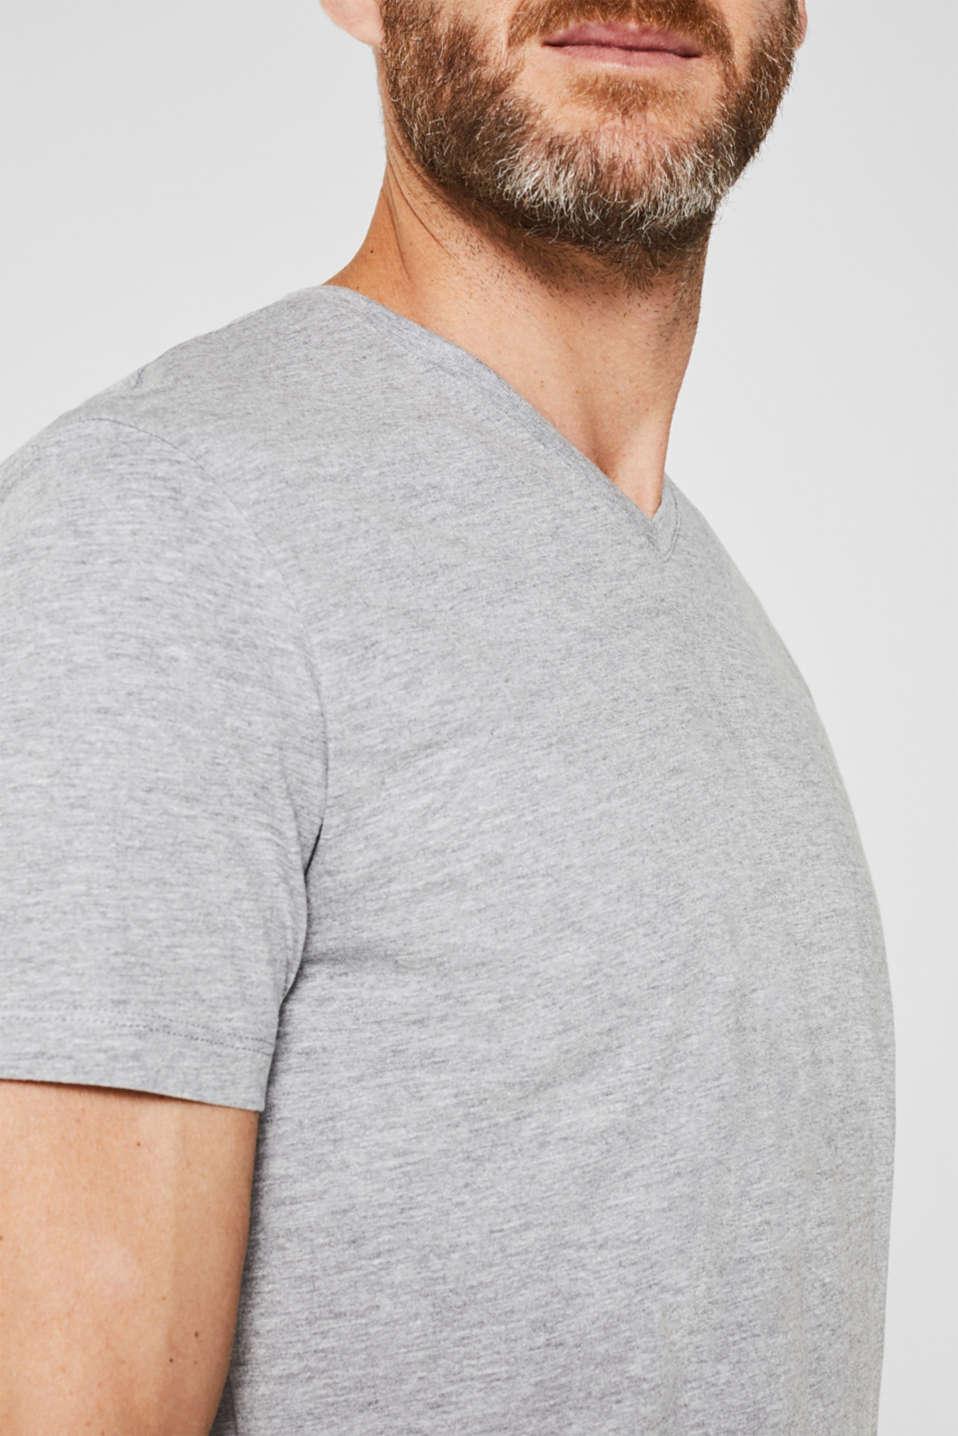 Jersey T-shirt with a V-neckline, MEDIUM GREY 5, detail image number 1